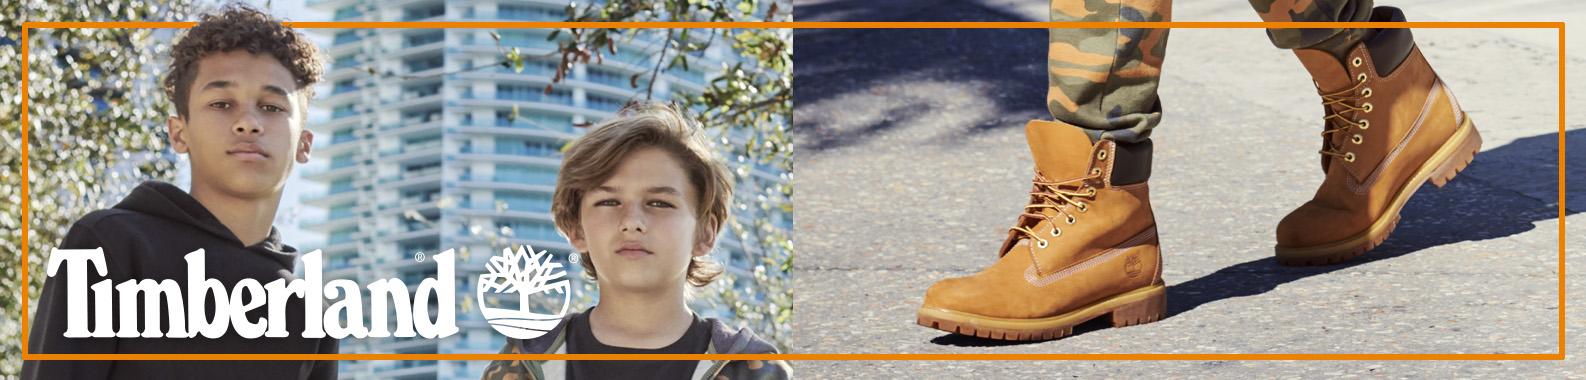 Timberland brand header image